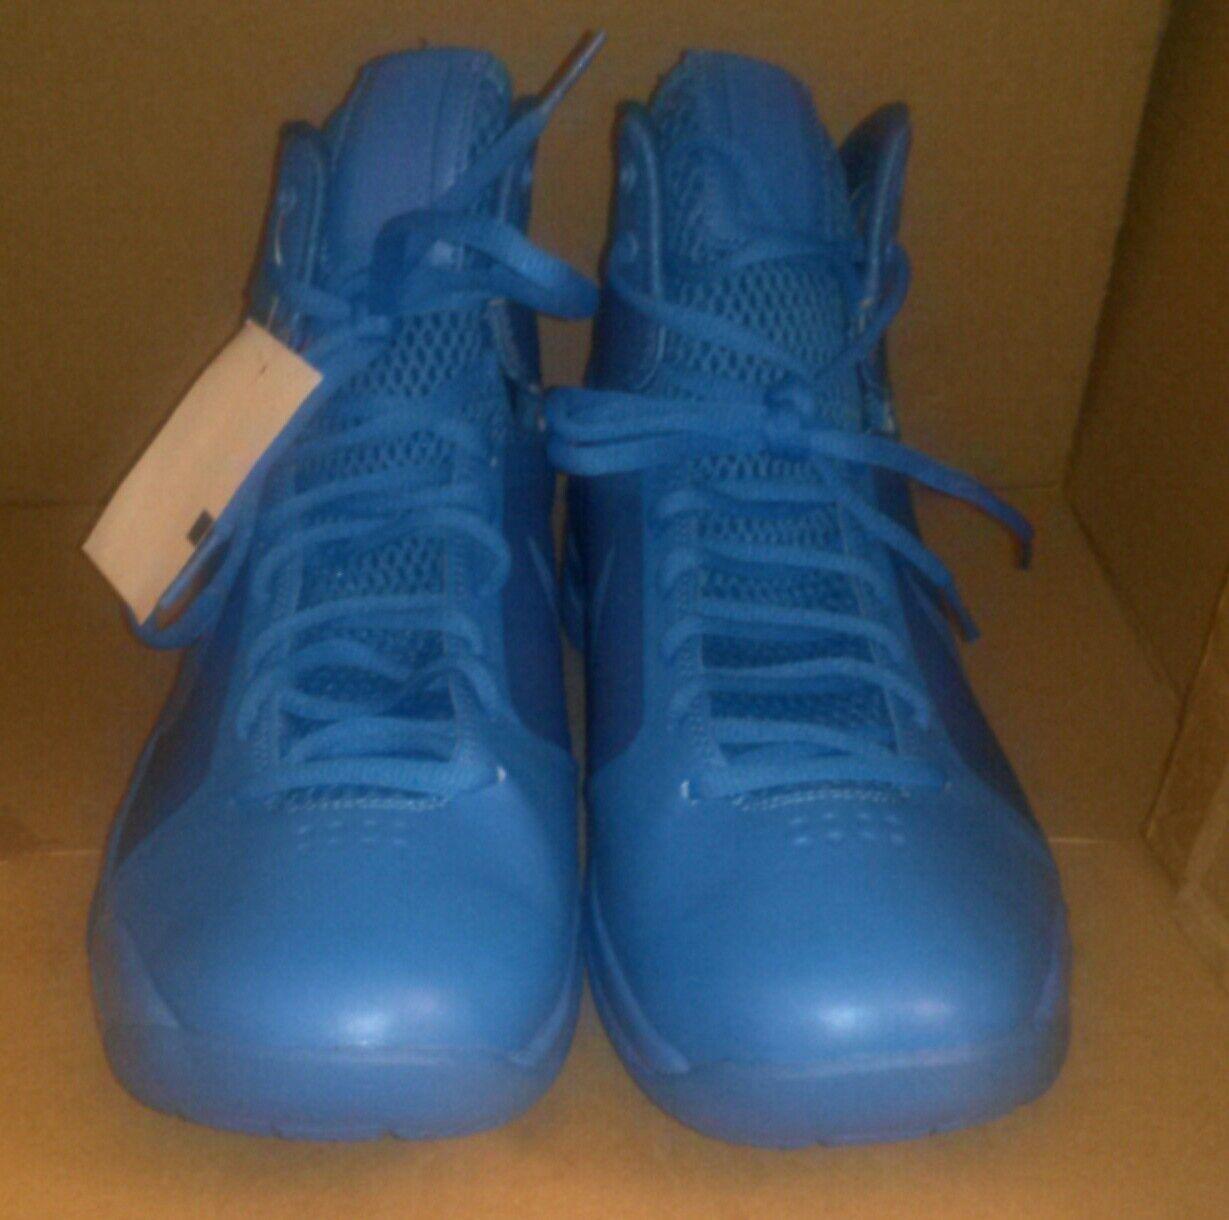 Nike HyperDunk NEW 08 Retro MEN Basketball lifestyle shoes 2016 BLUE SIZE 10